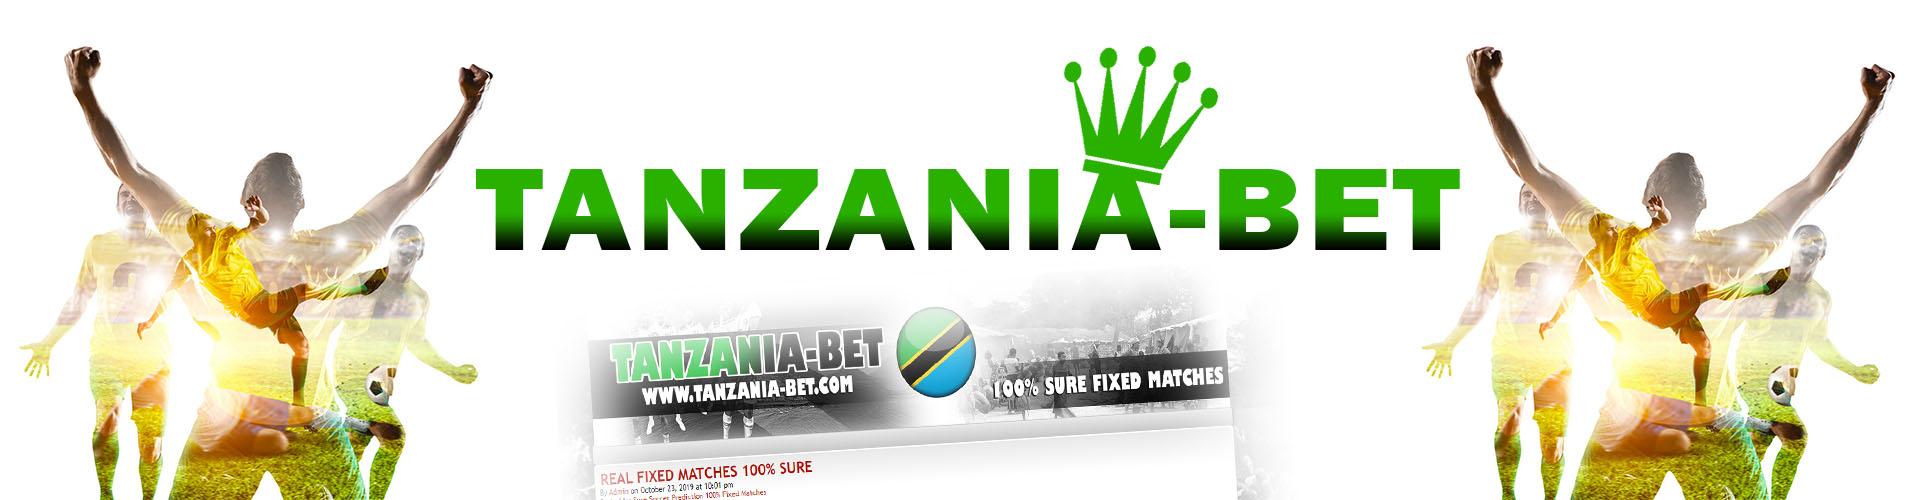 tanzania fixed matches 100% sure